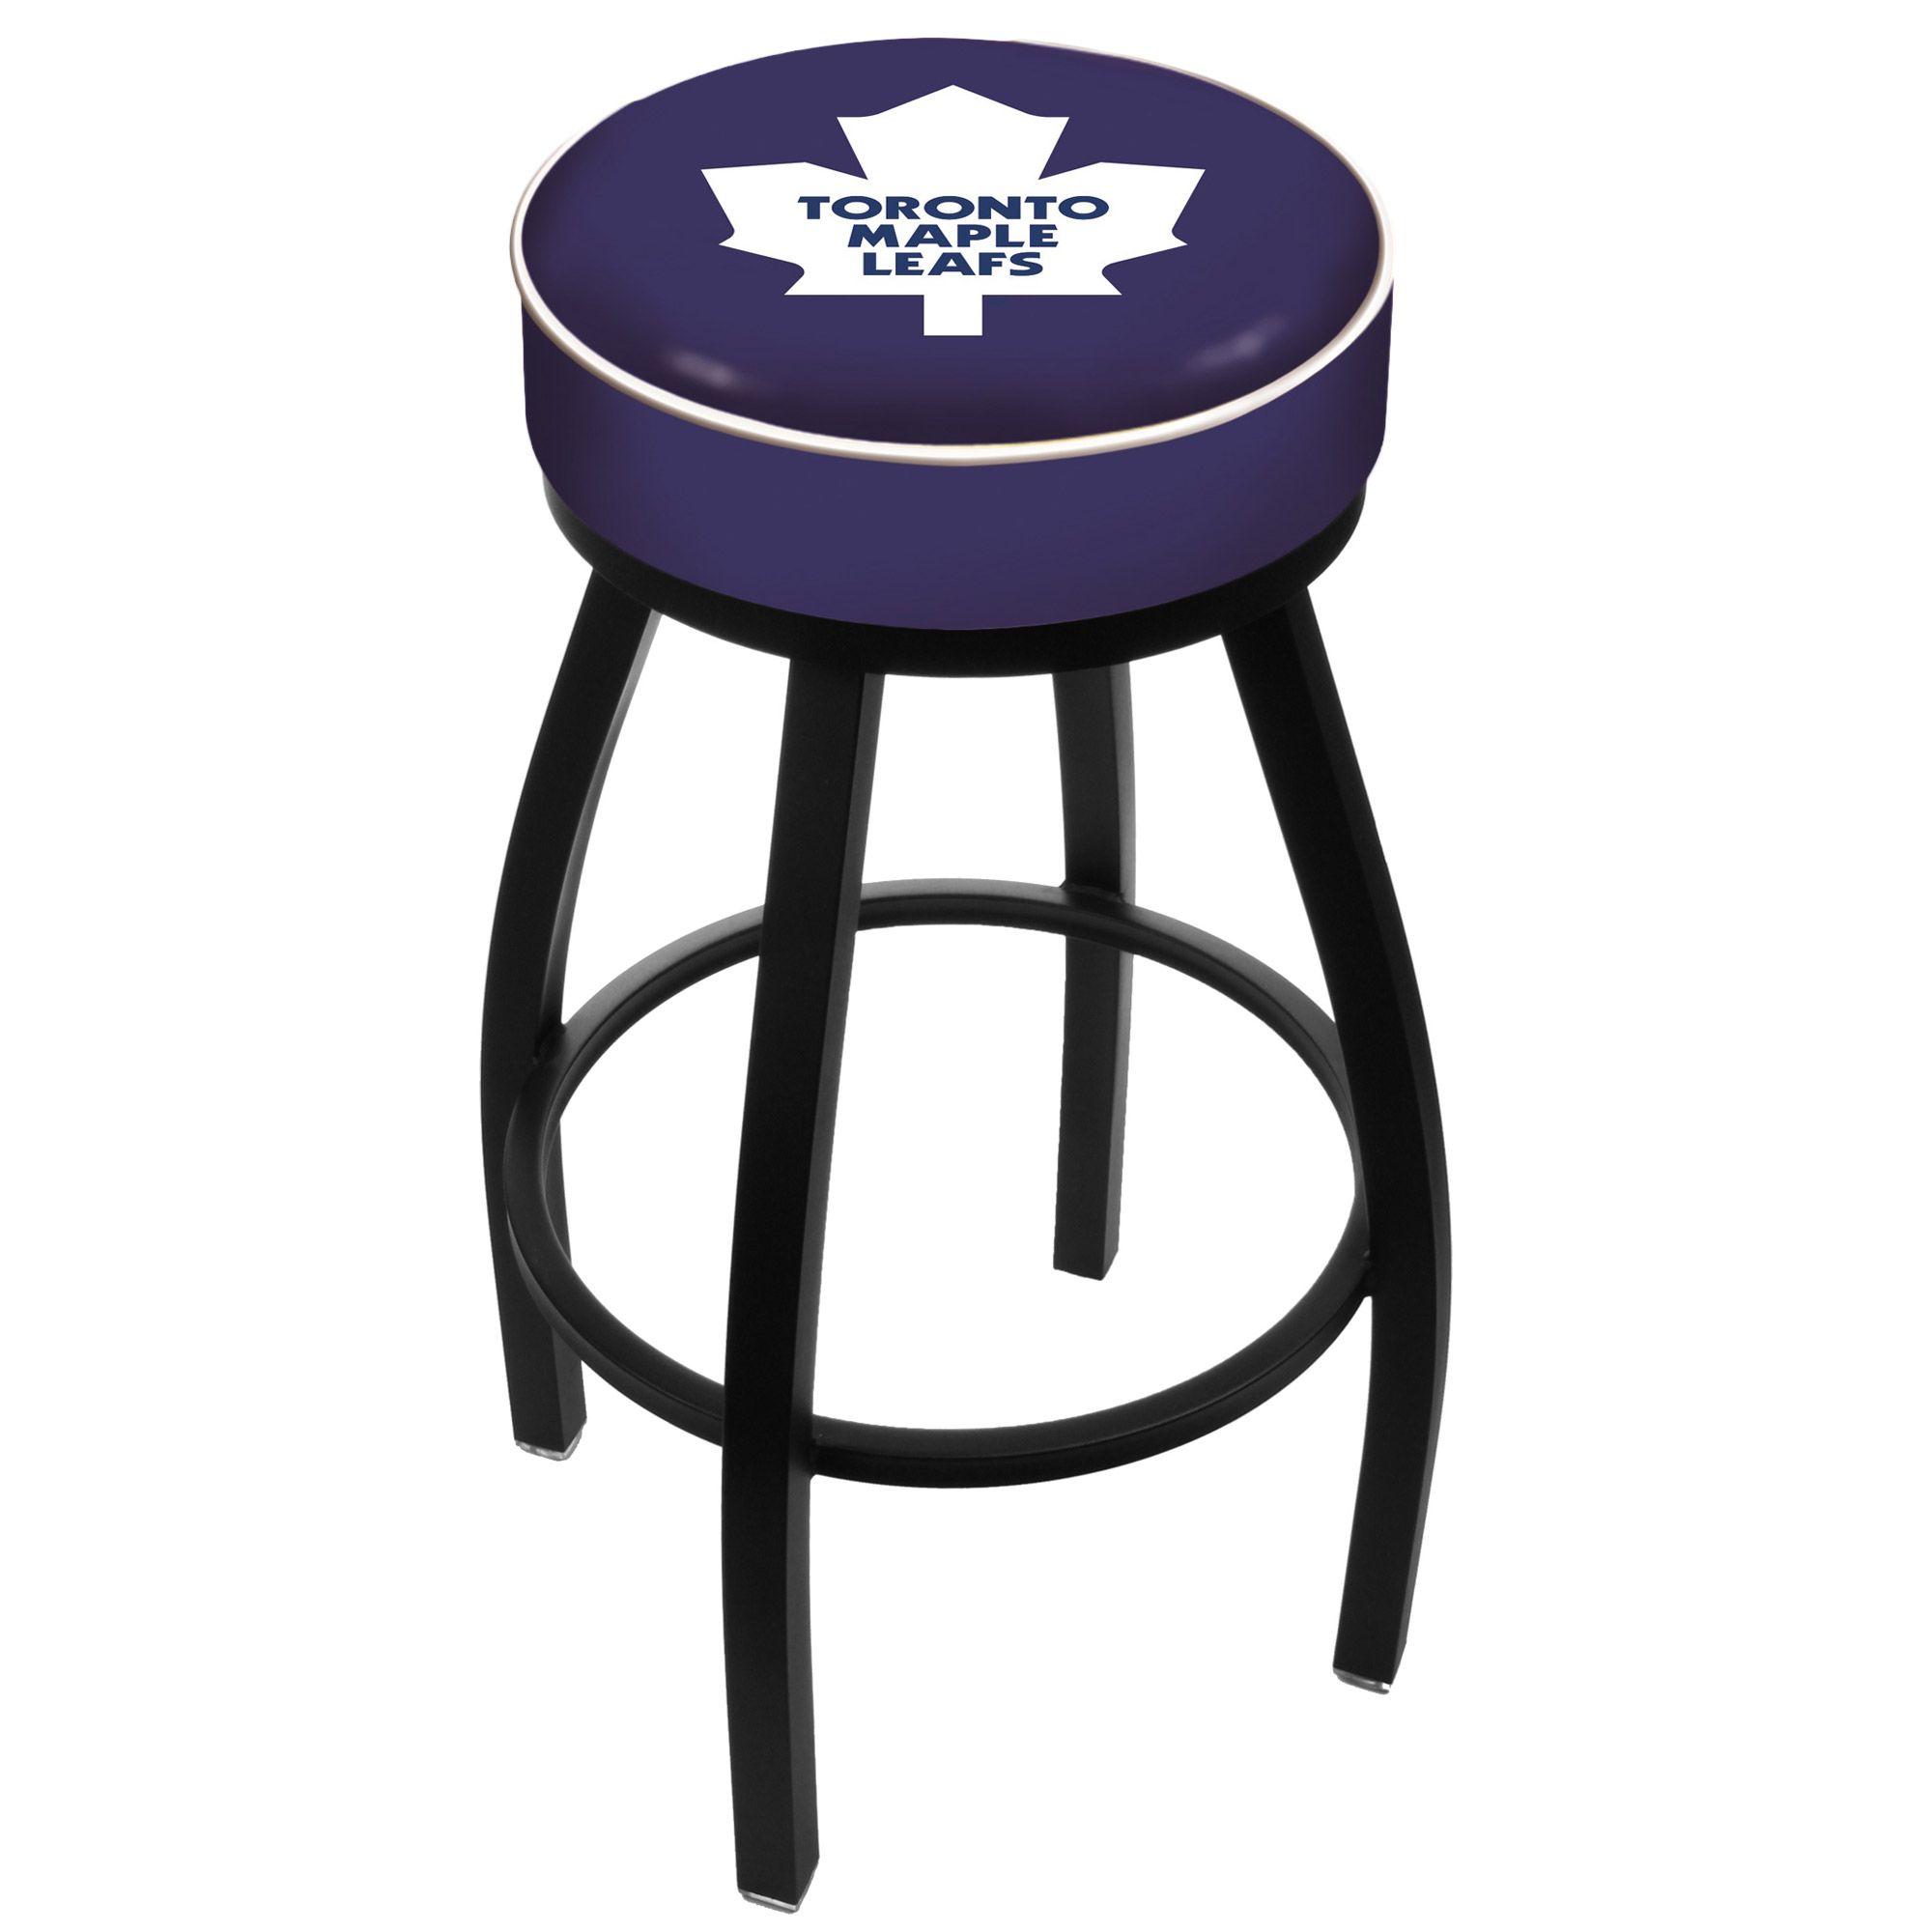 NHL Toronto Maple Leafs Padded Swivel Bar Stool